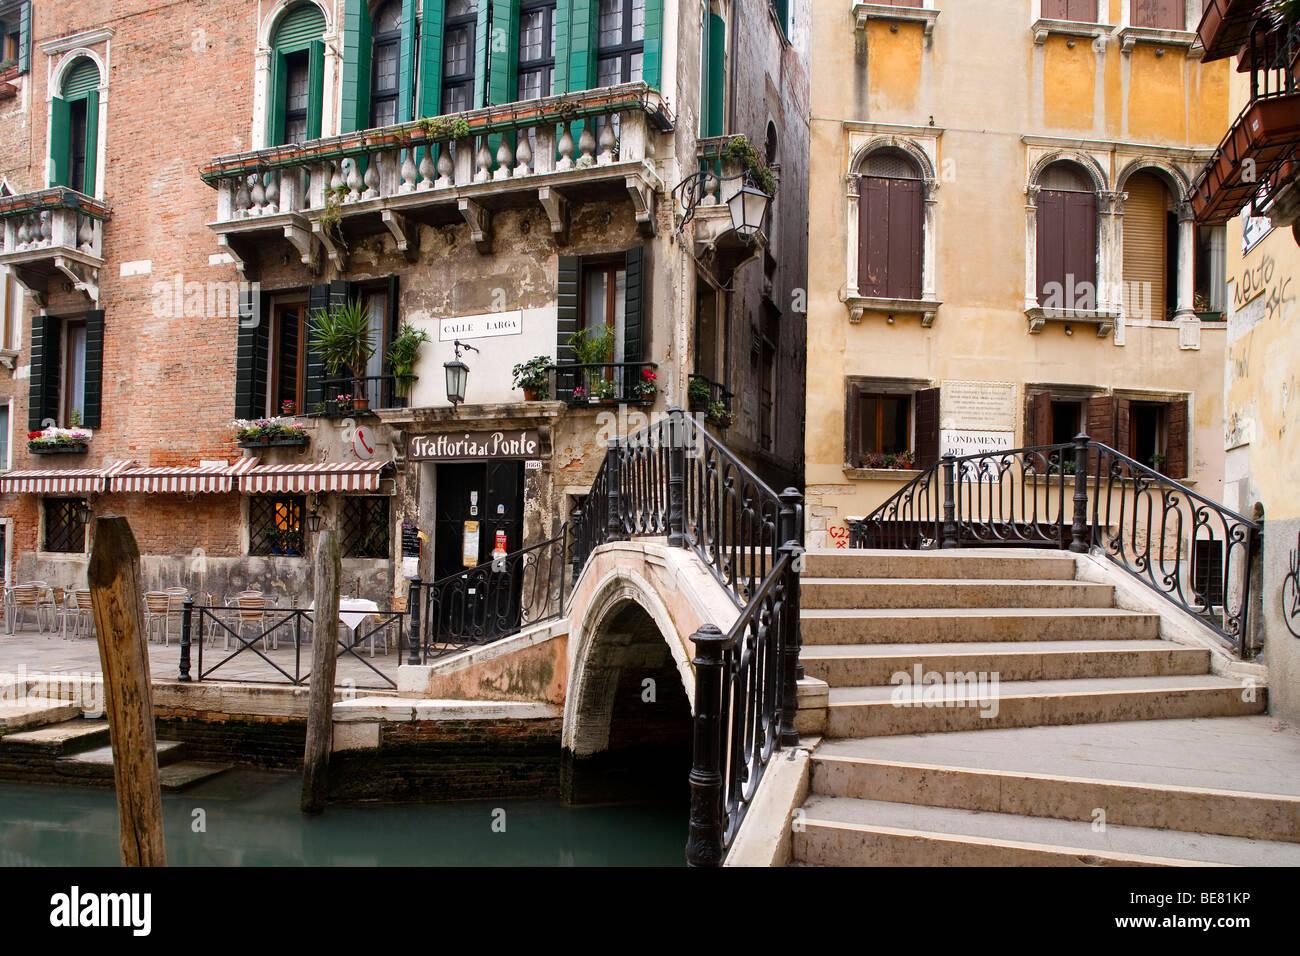 Trattoria al Ponte at the Calle Larga, Venice, Italy, Europe - Stock Image